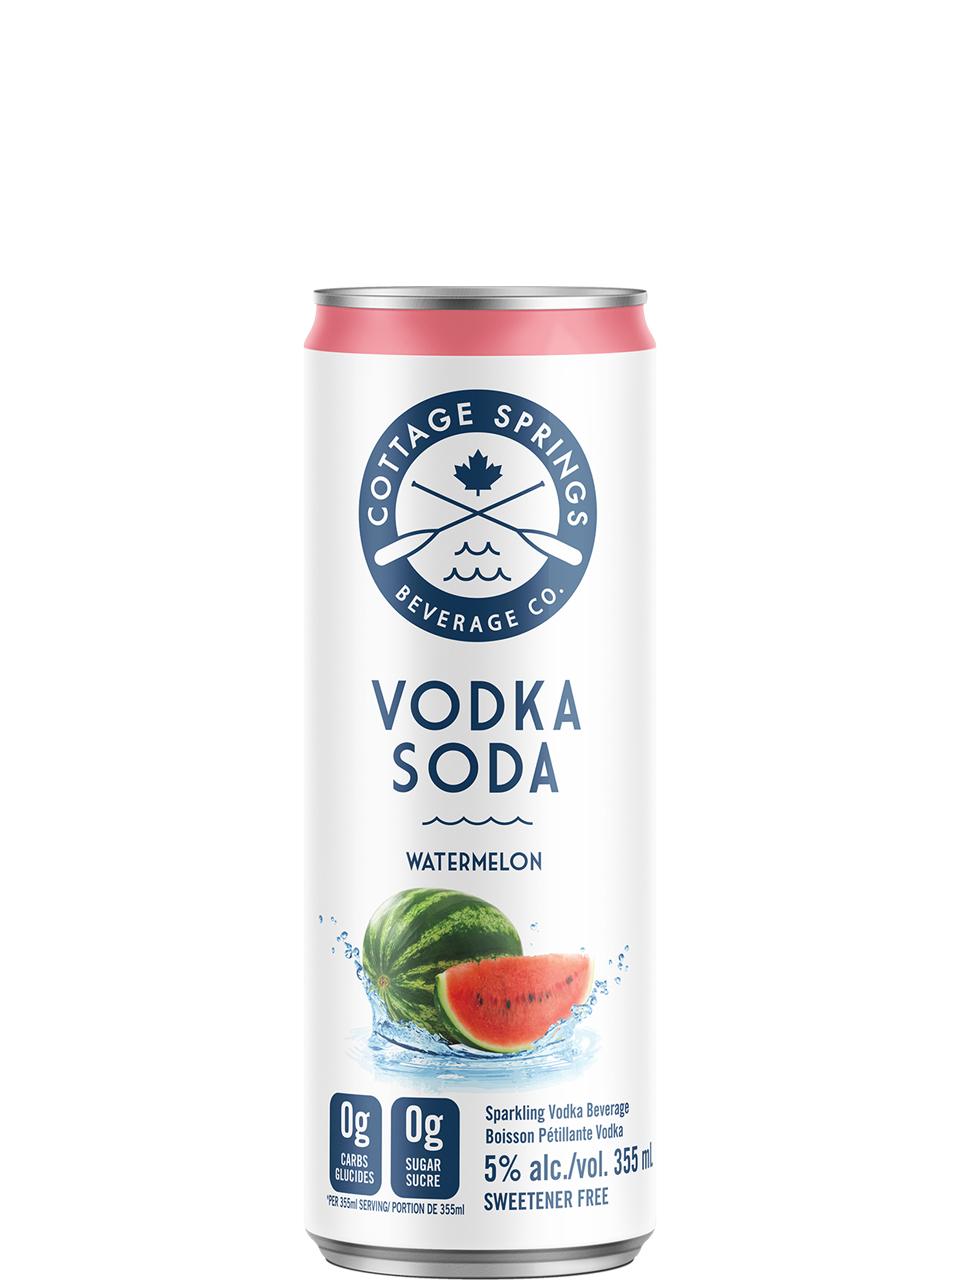 Cottage Springs Vodka Soda Watermelon